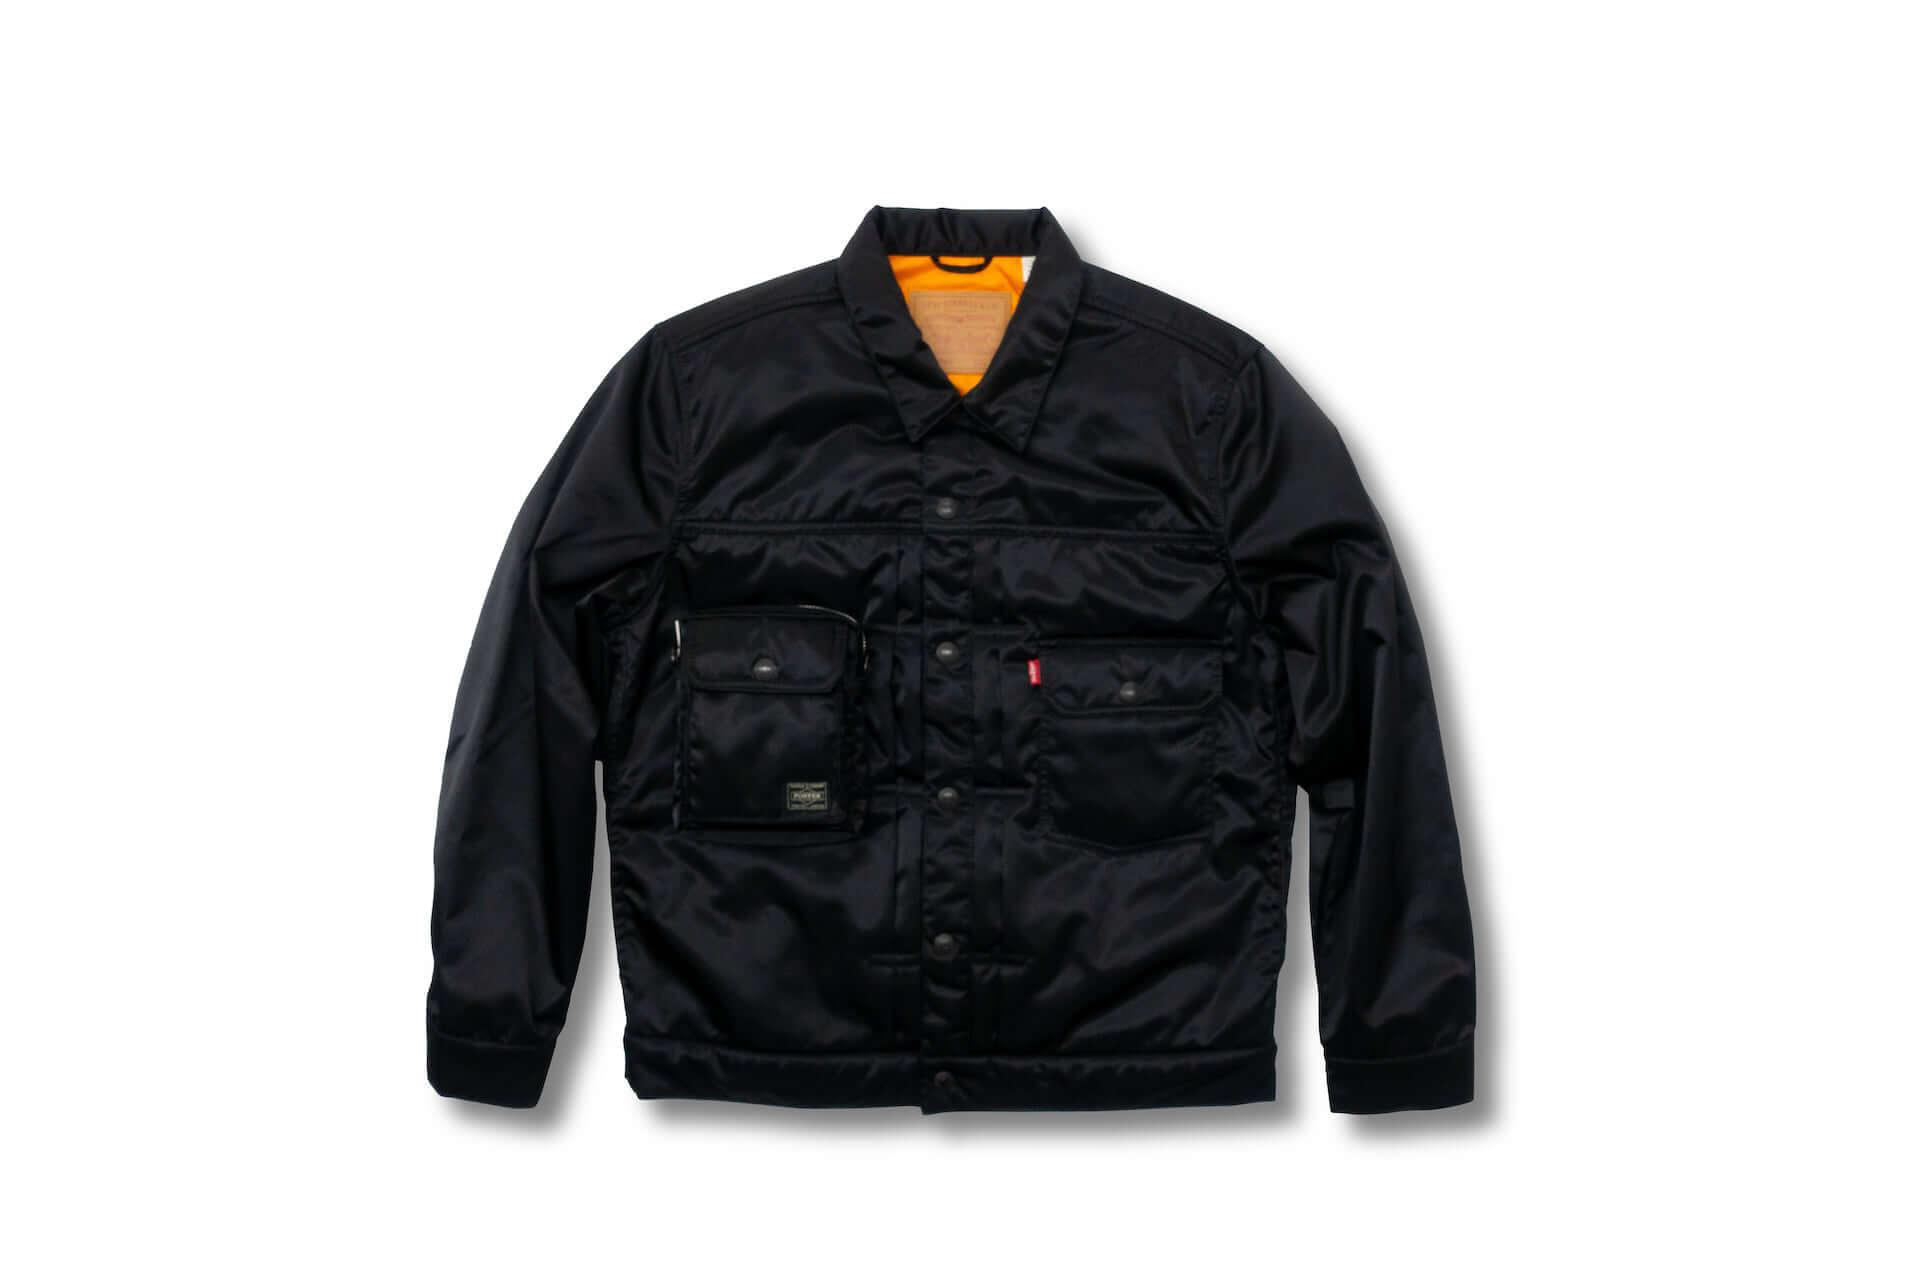 Levi's®︎とPORTERのコラボによる限定トラッカージャケットが発売決定!吉田カバン創業85周年記念モデル lf201020_levis-porter_4-1920x1280